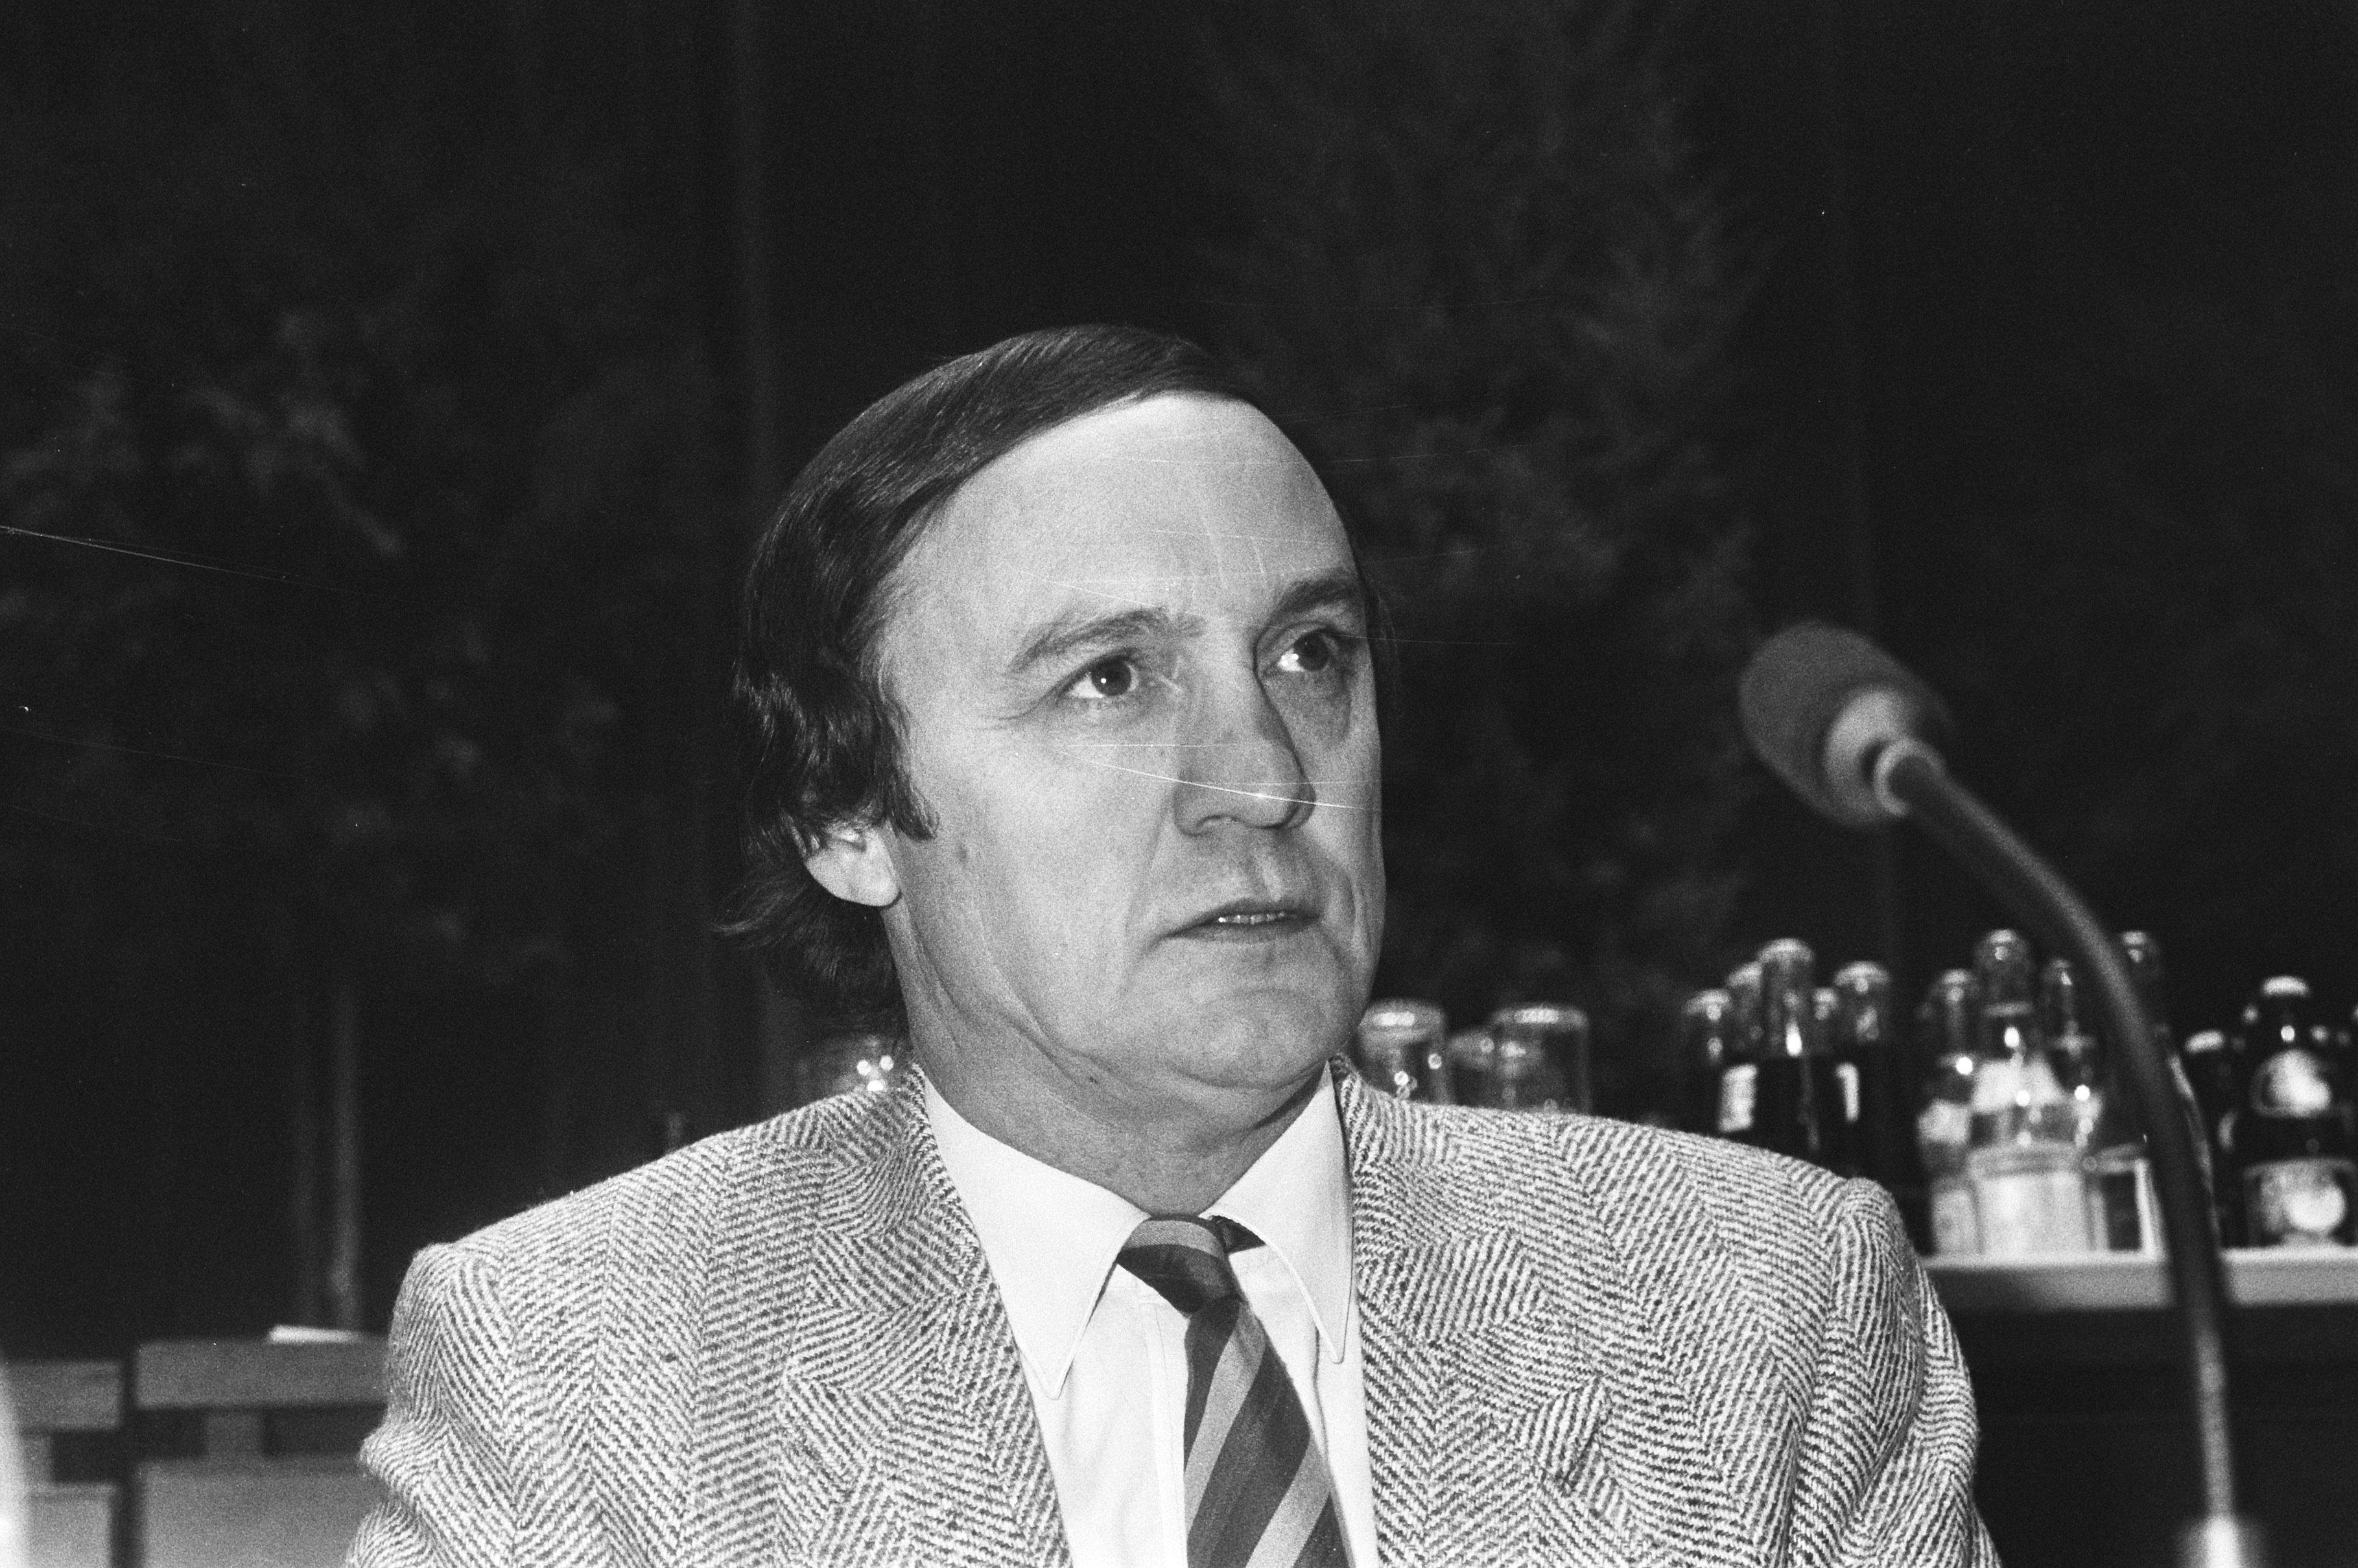 Karel Van Miert